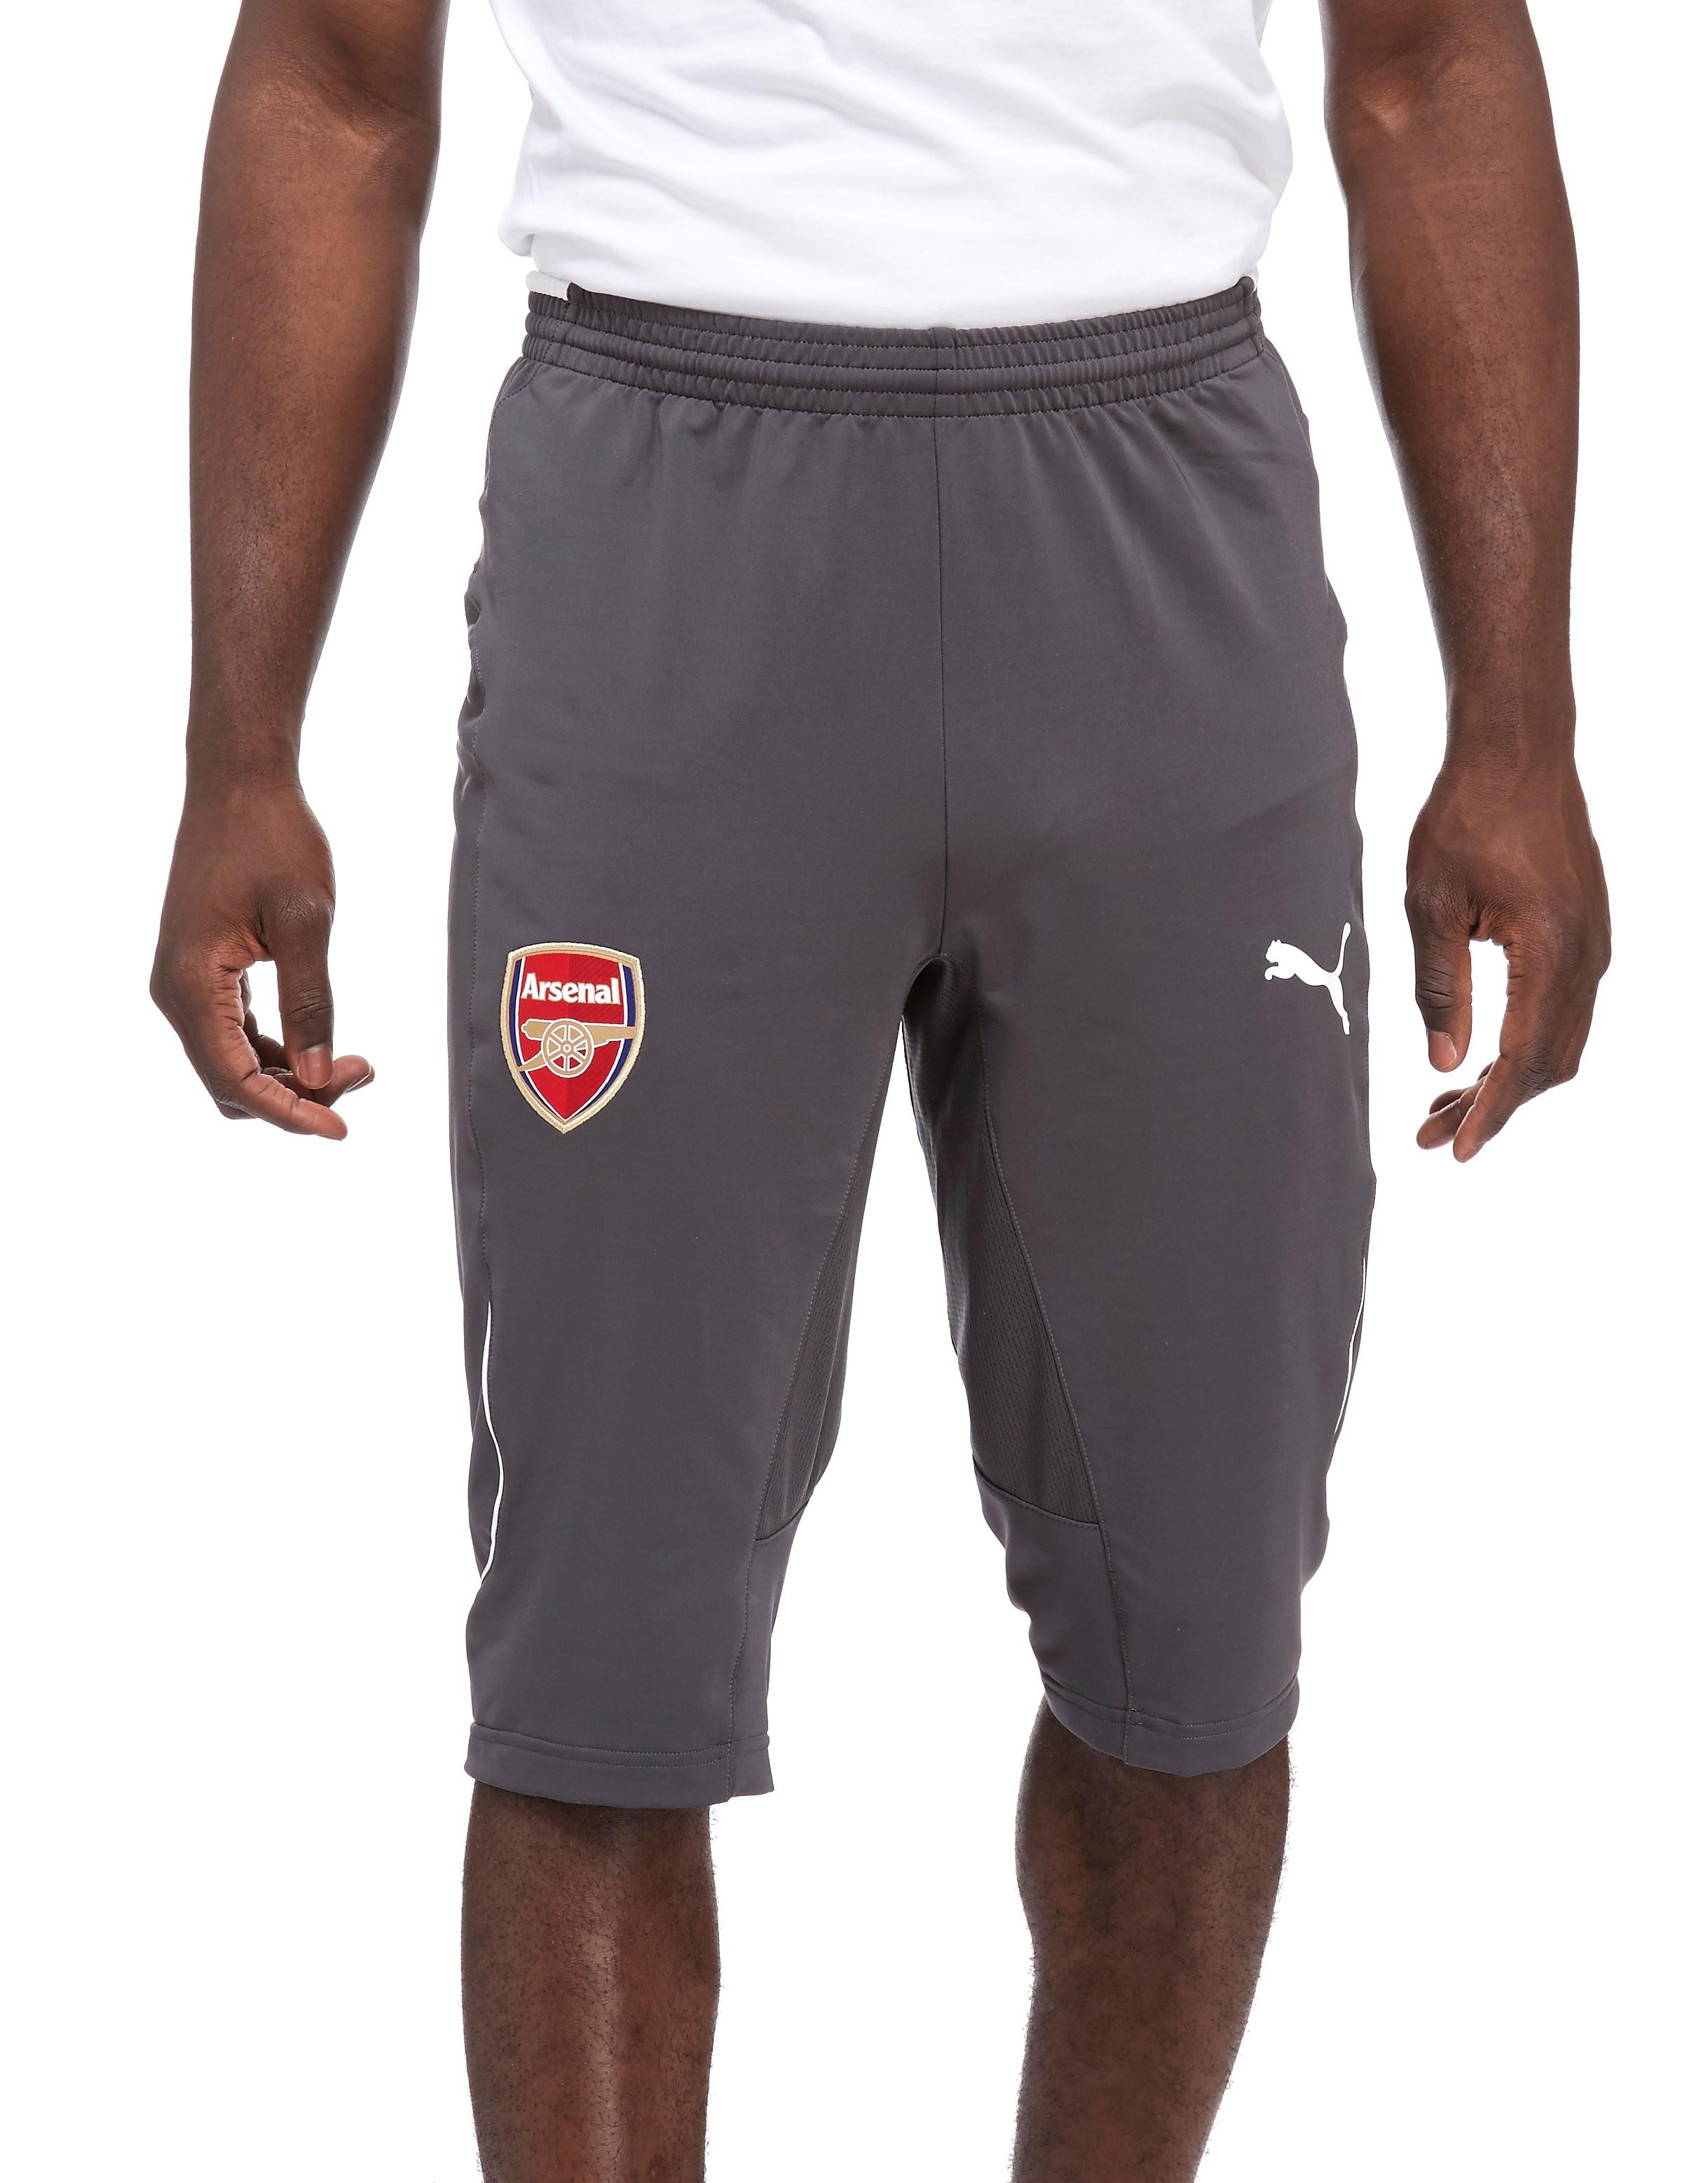 PUMA Arsenal FC 2017 3/4 Length Training Pants